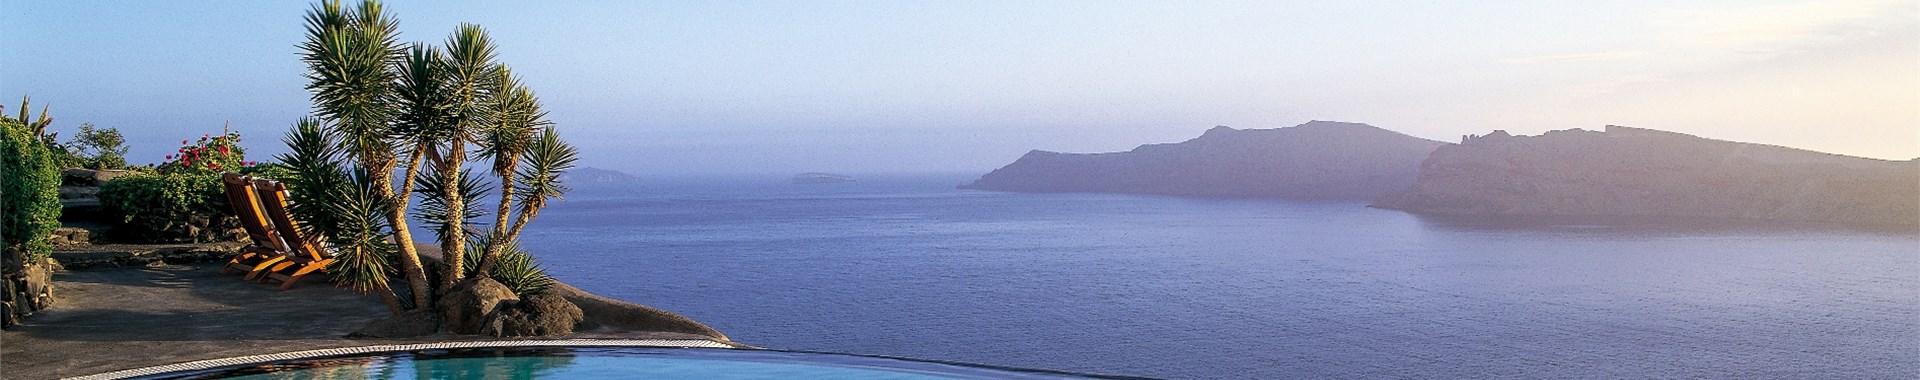 Santorini 5 Star Hotels